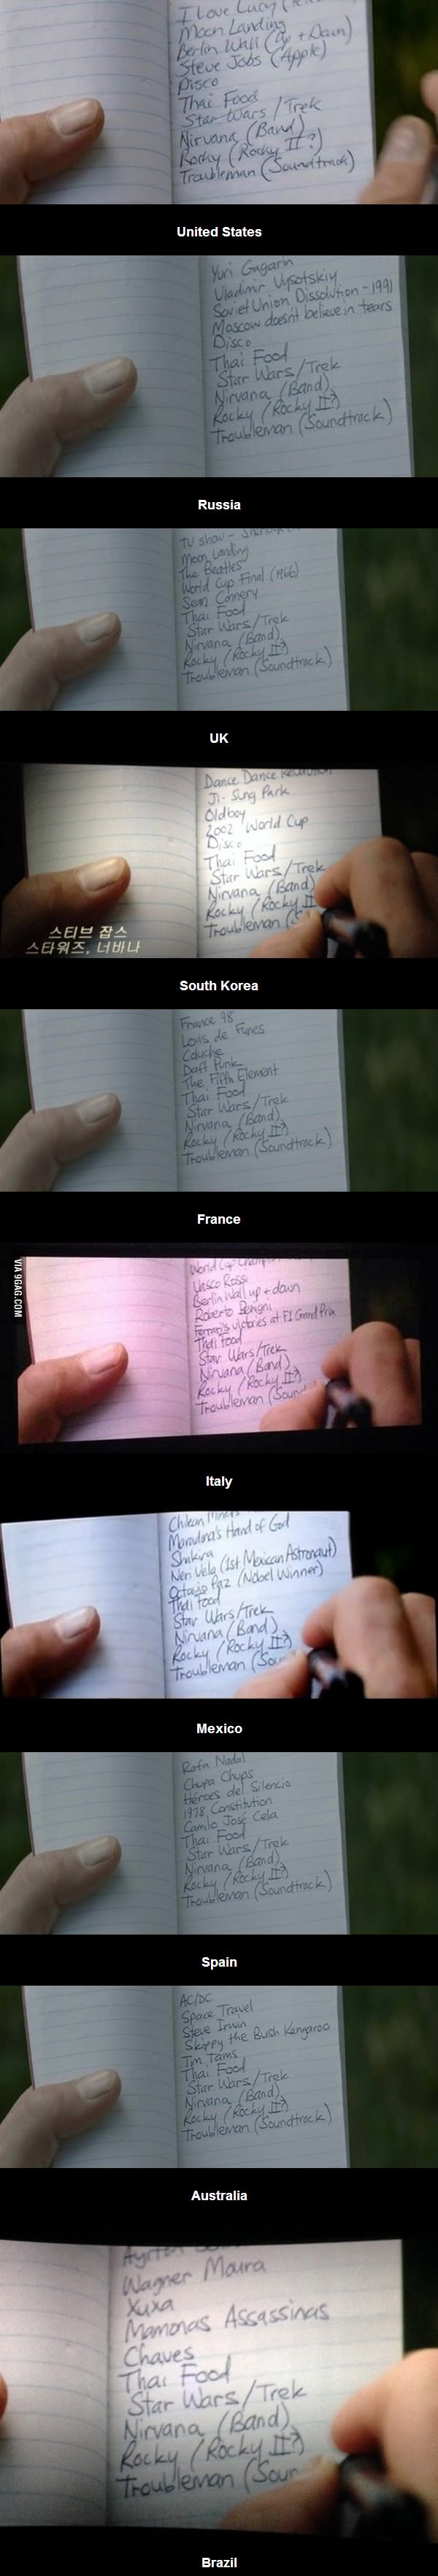 Captain America's notebook